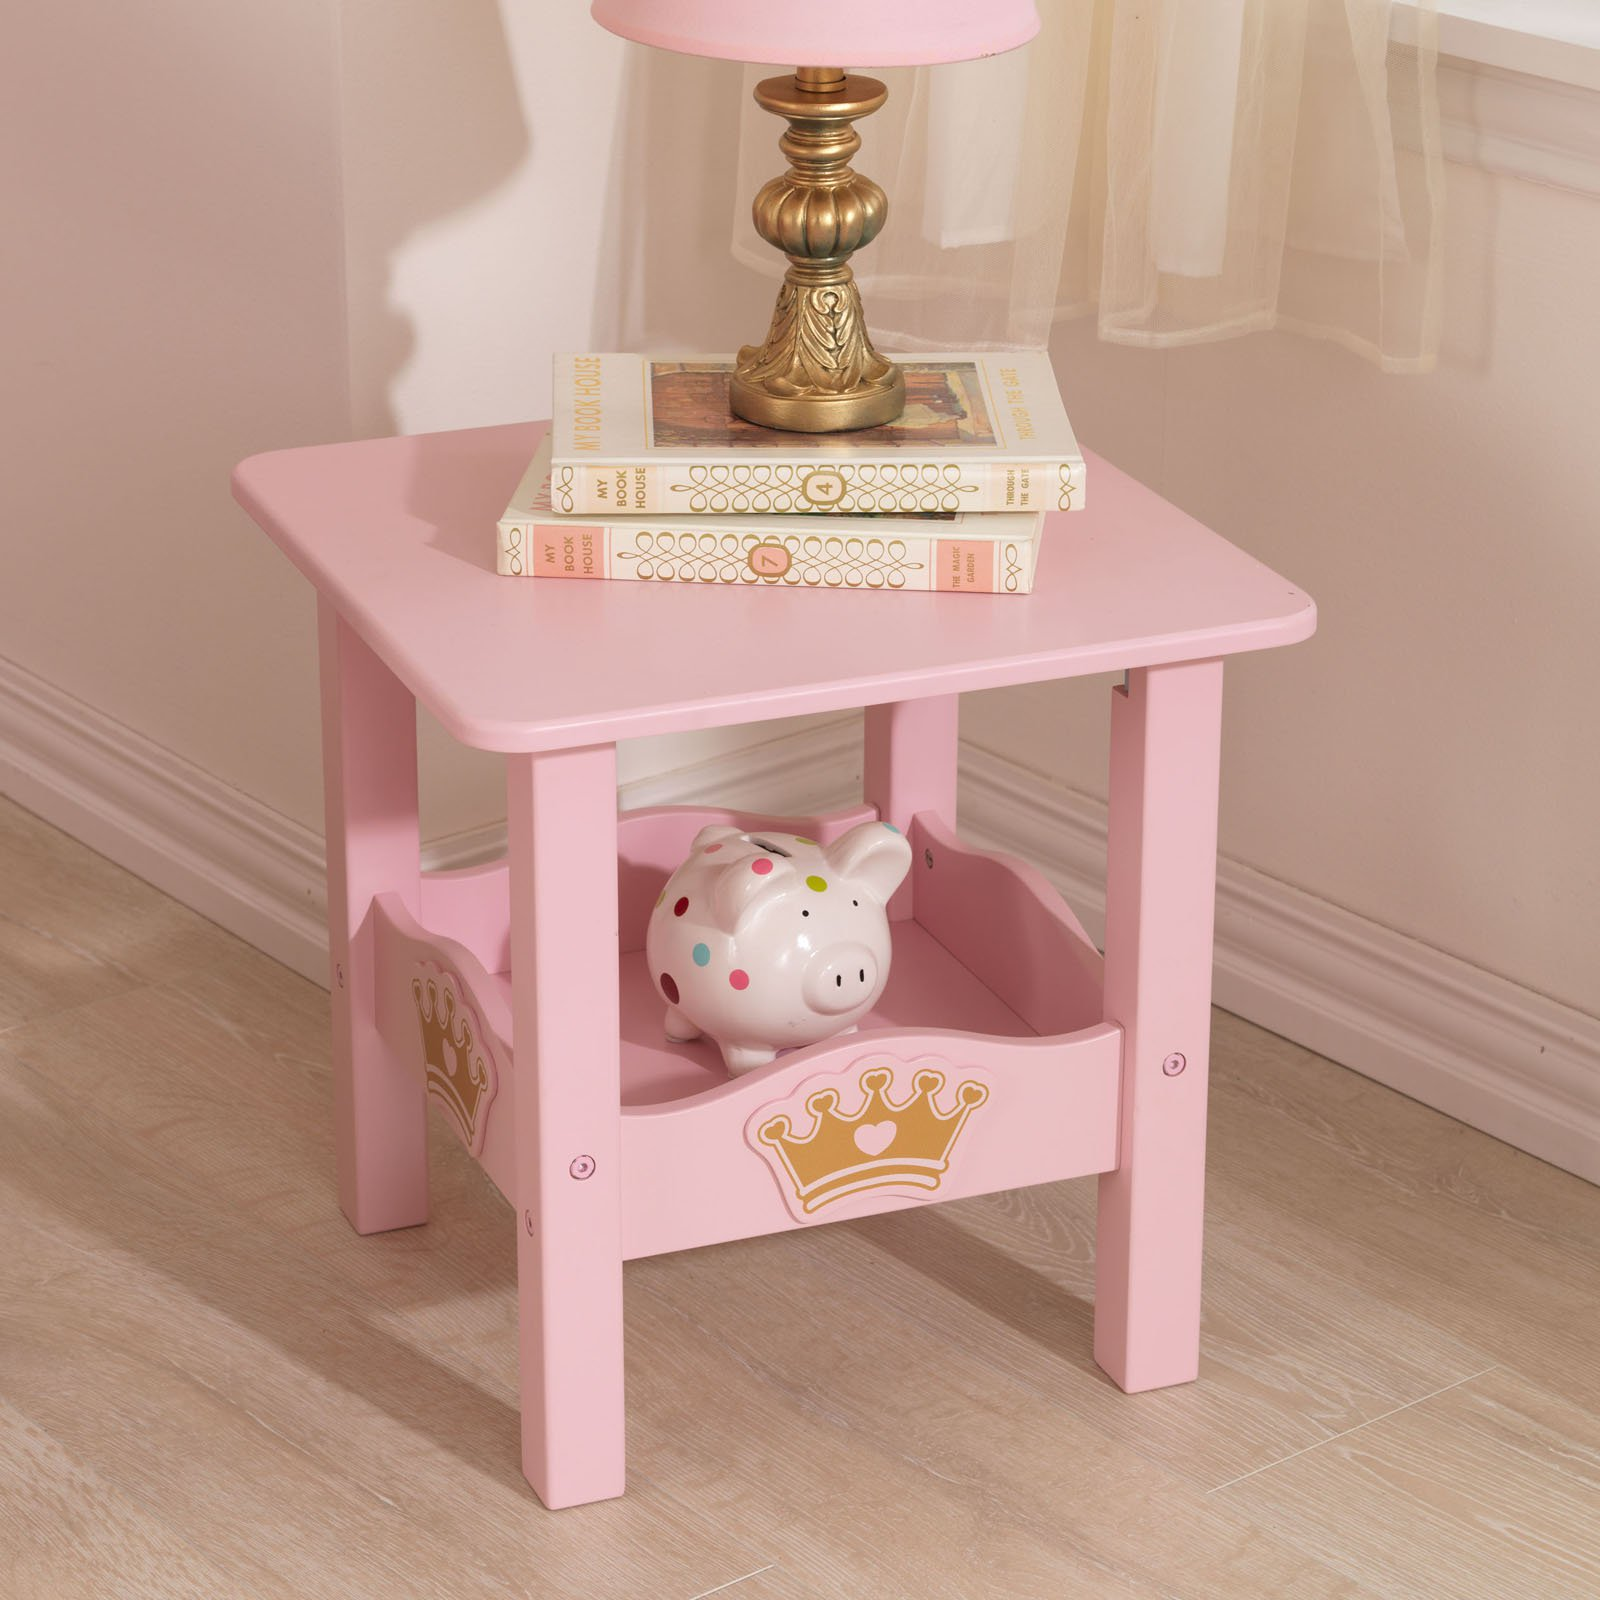 KidKraft Princess Daybed Side Table